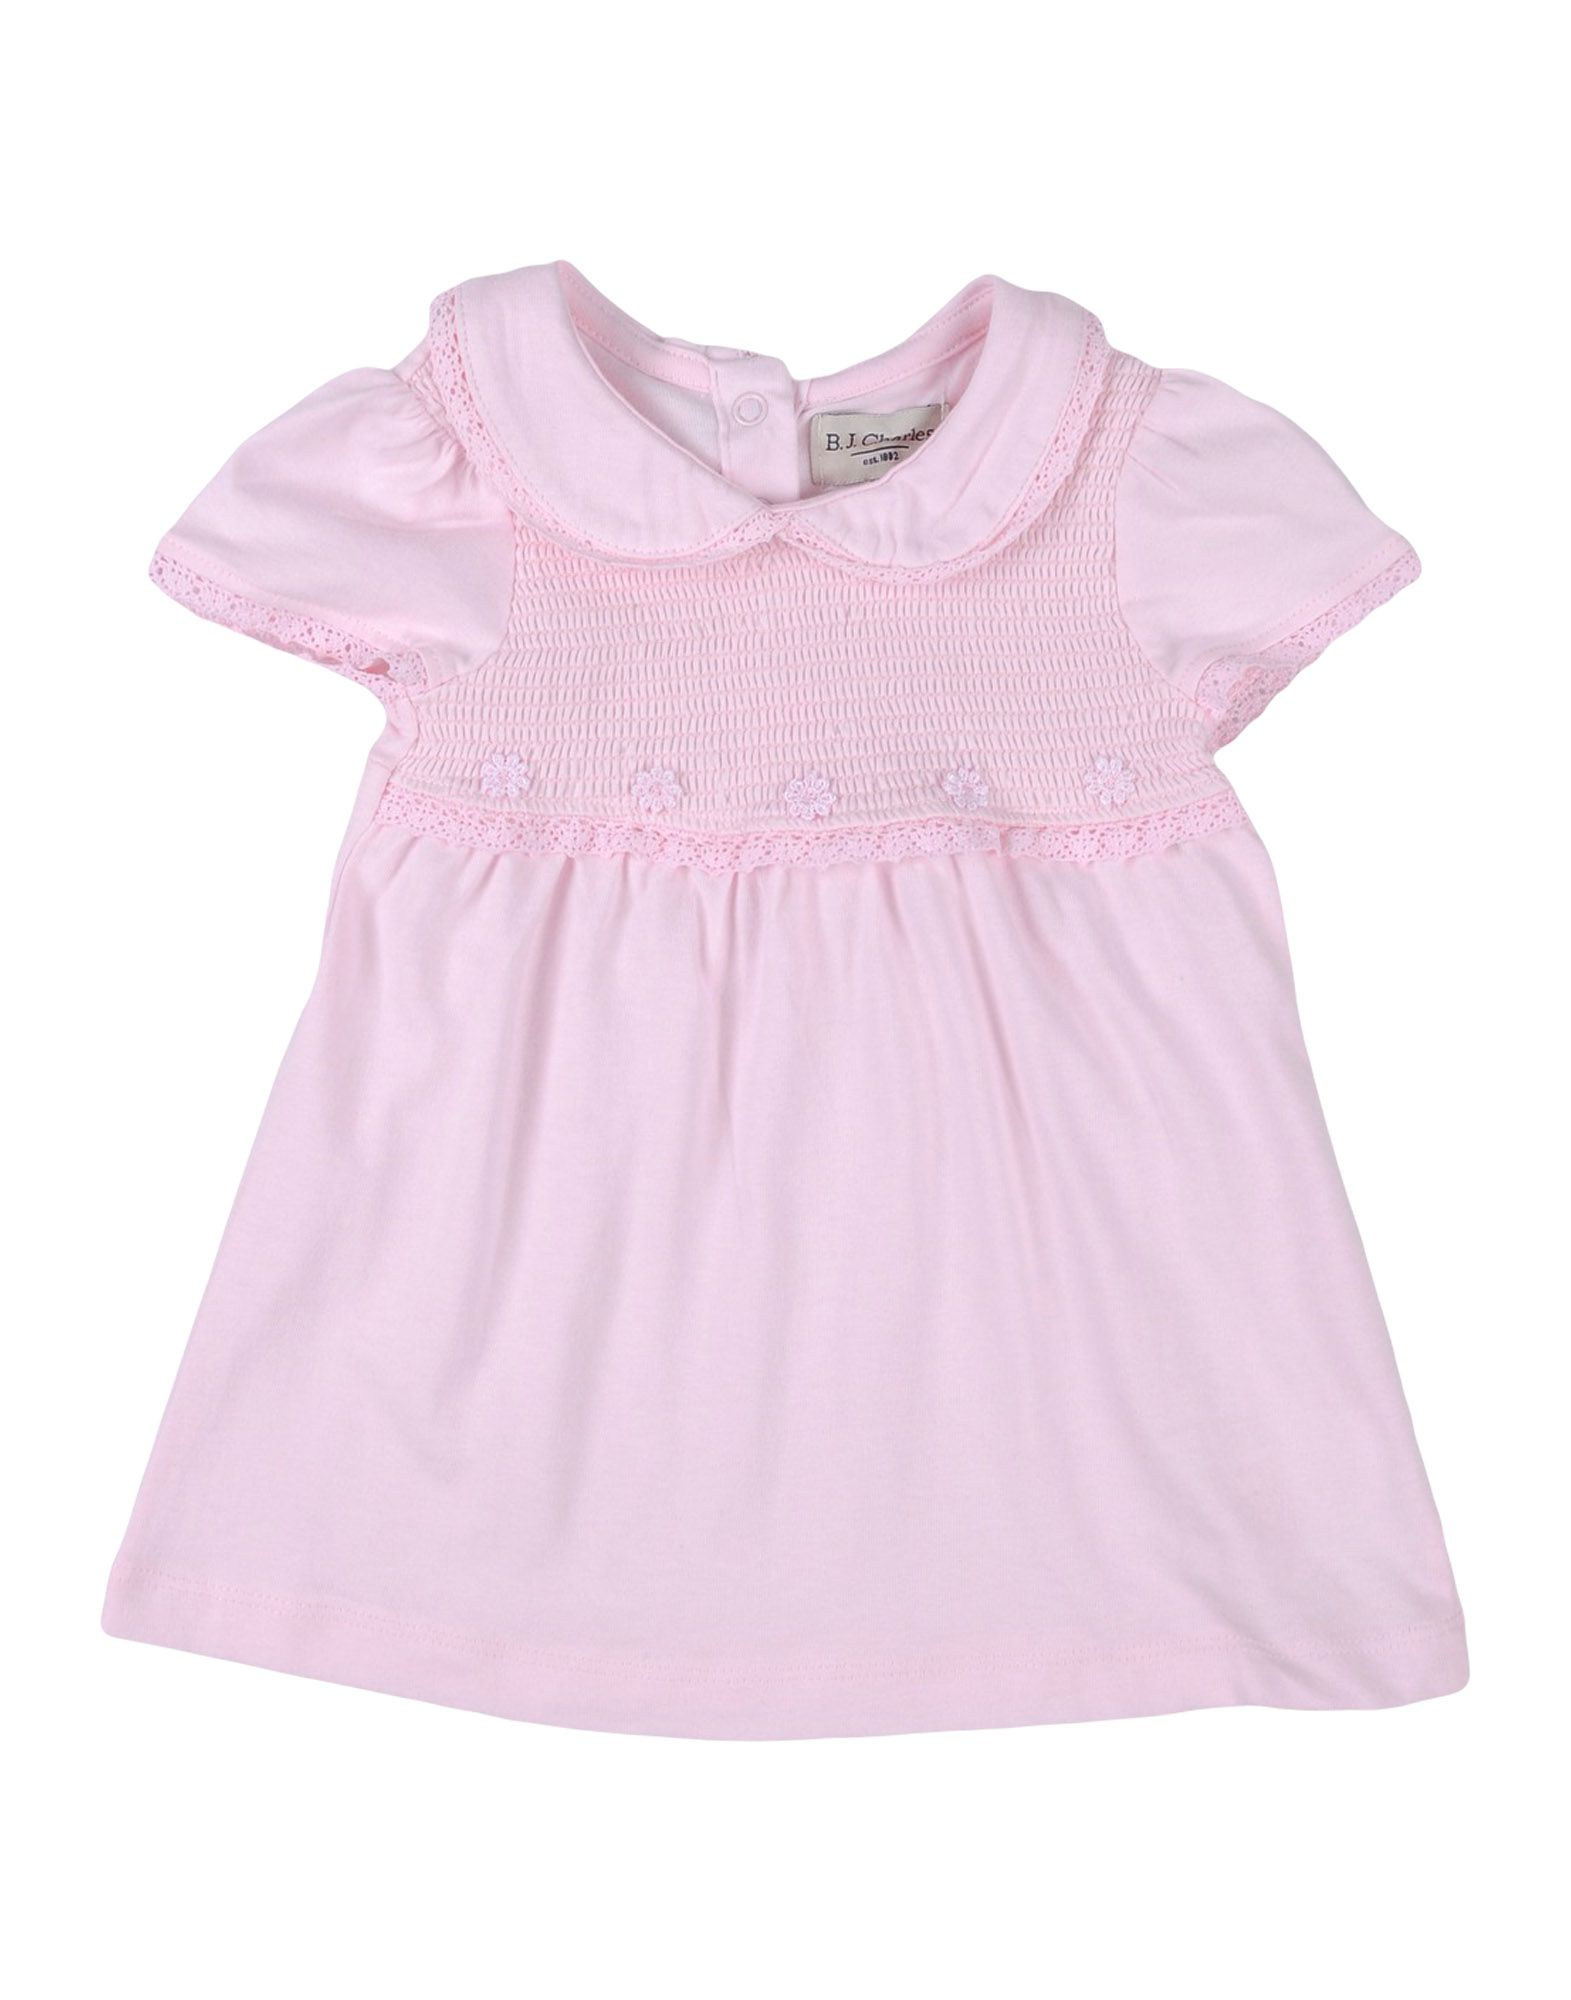 B.j.charles Kids' Dresses In Pink